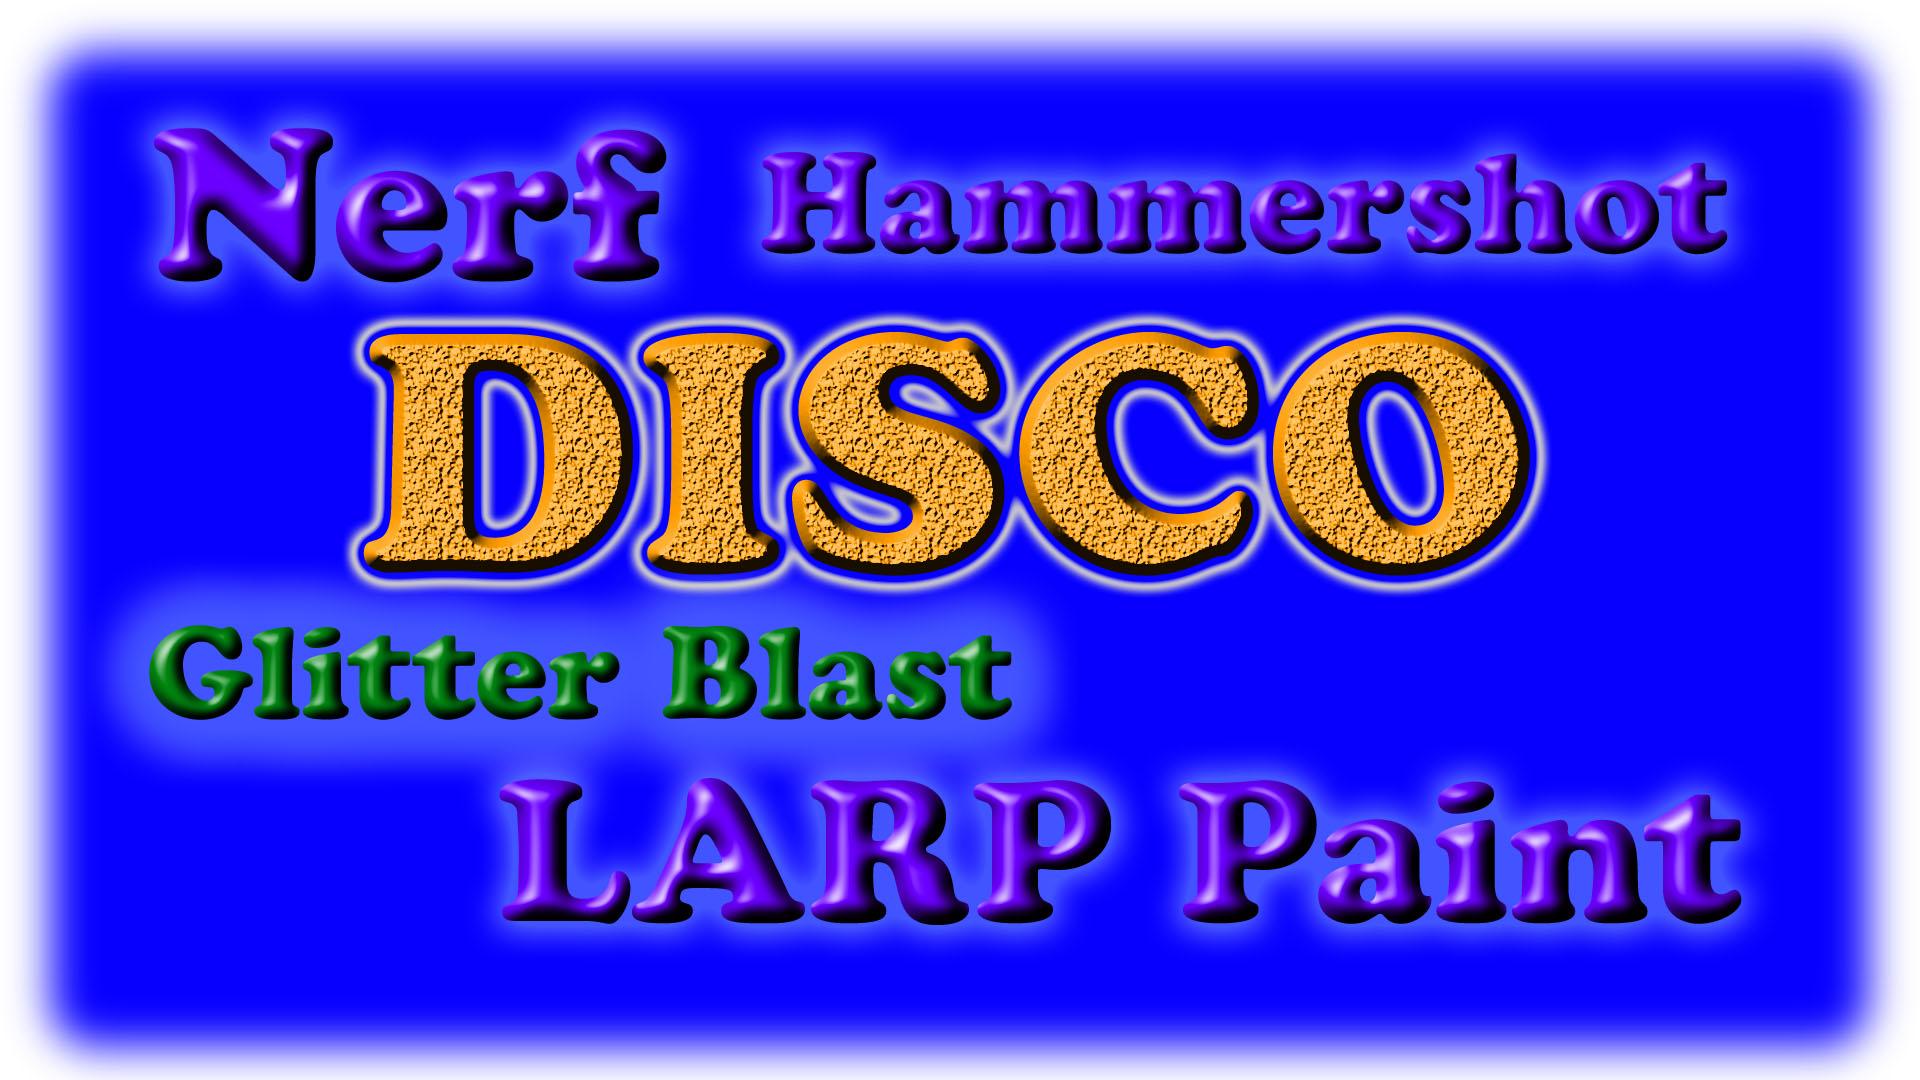 Picture of Nerf Hammershot Blaster Disco Glitter Blast LARP Paint